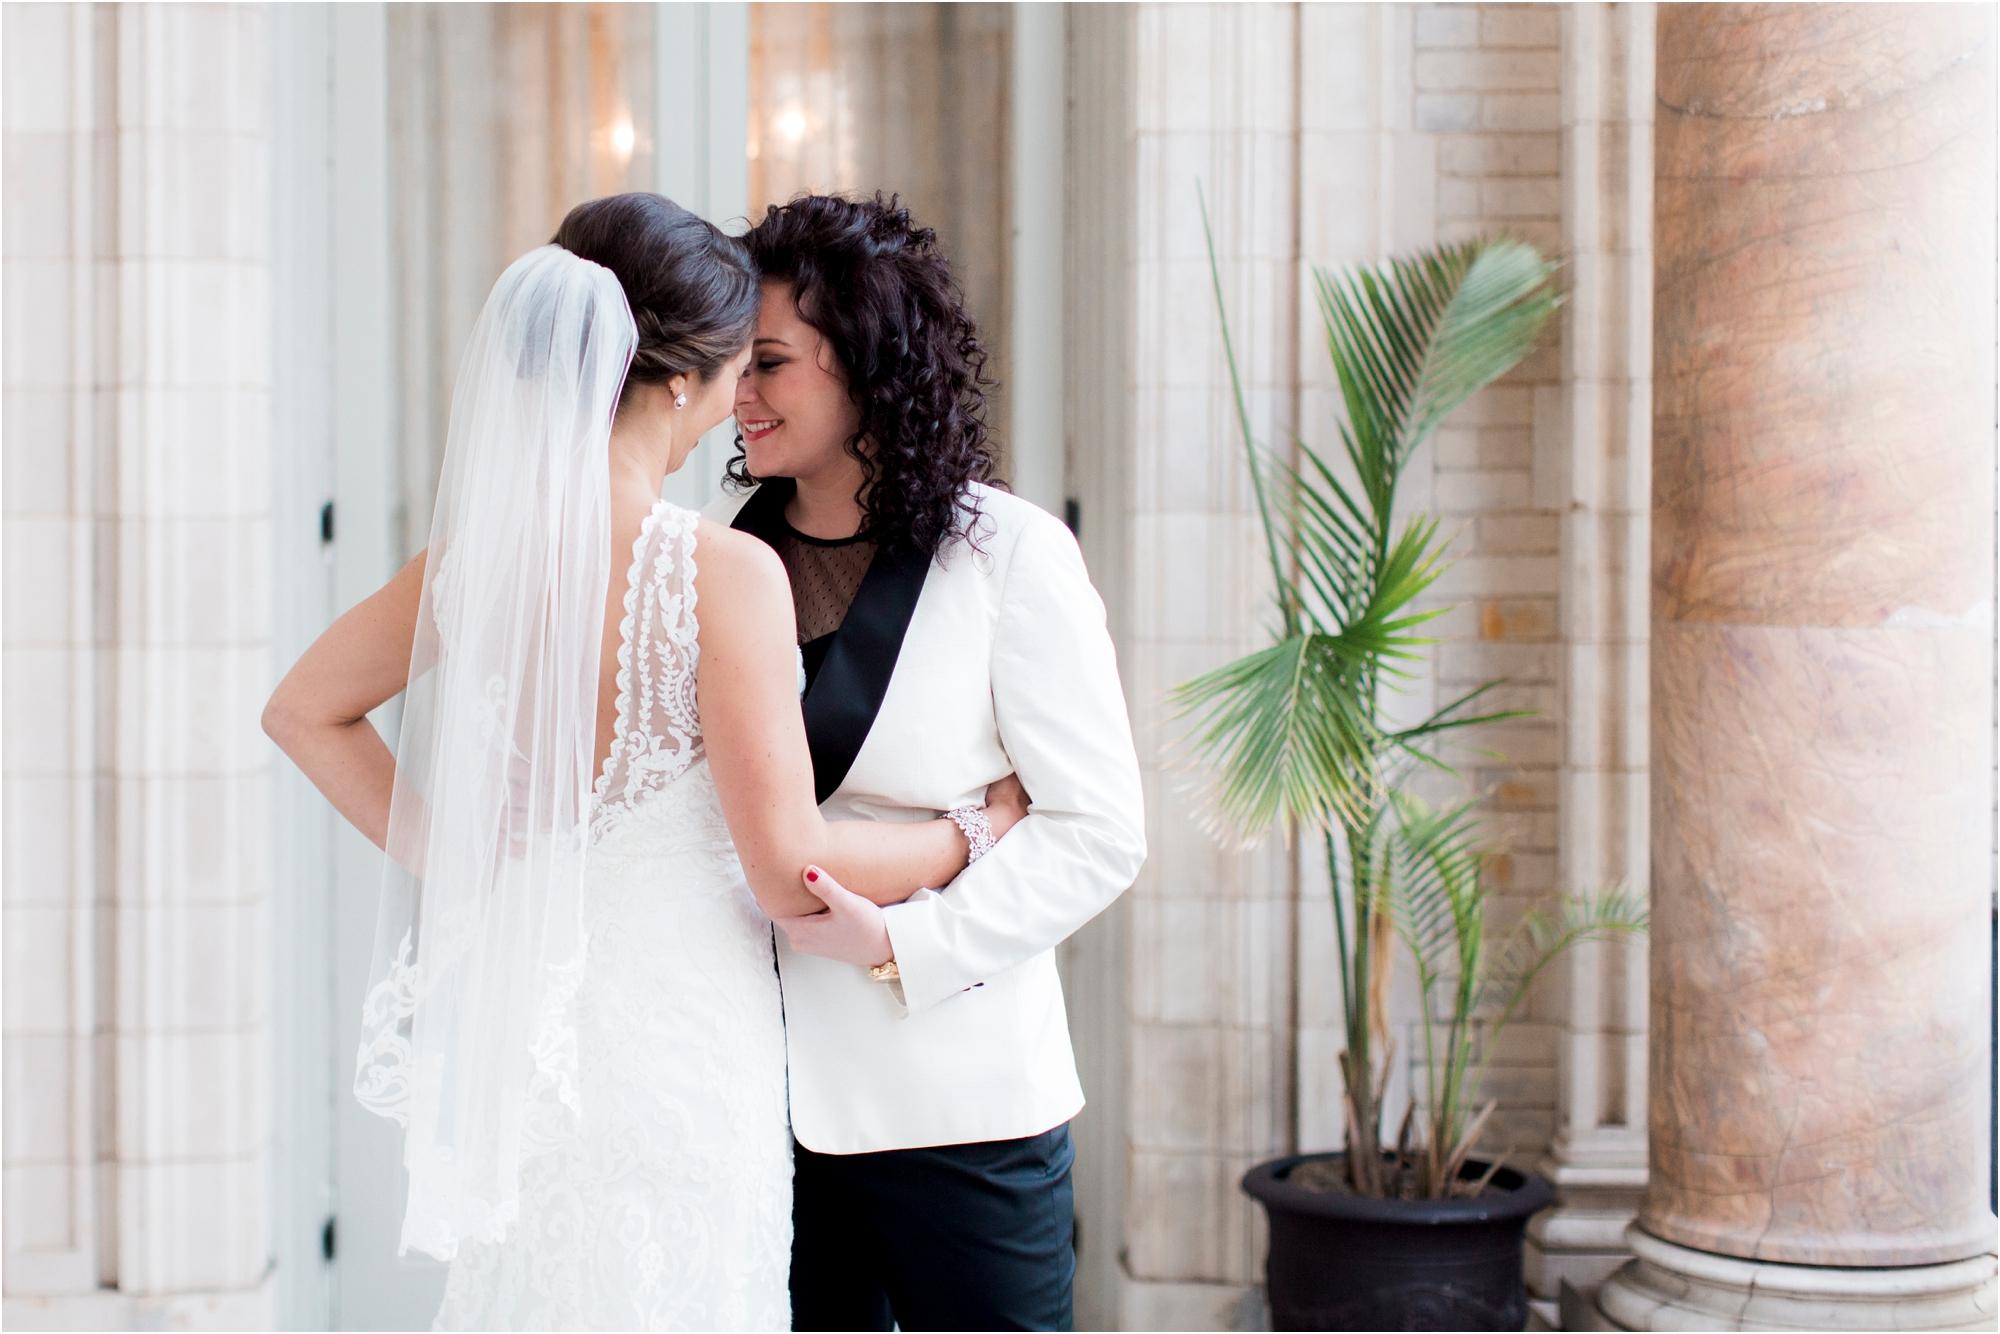 phoebe-mayme-richmond-virginia-colorful-love-is-love-wedding-photos_0001.jpg